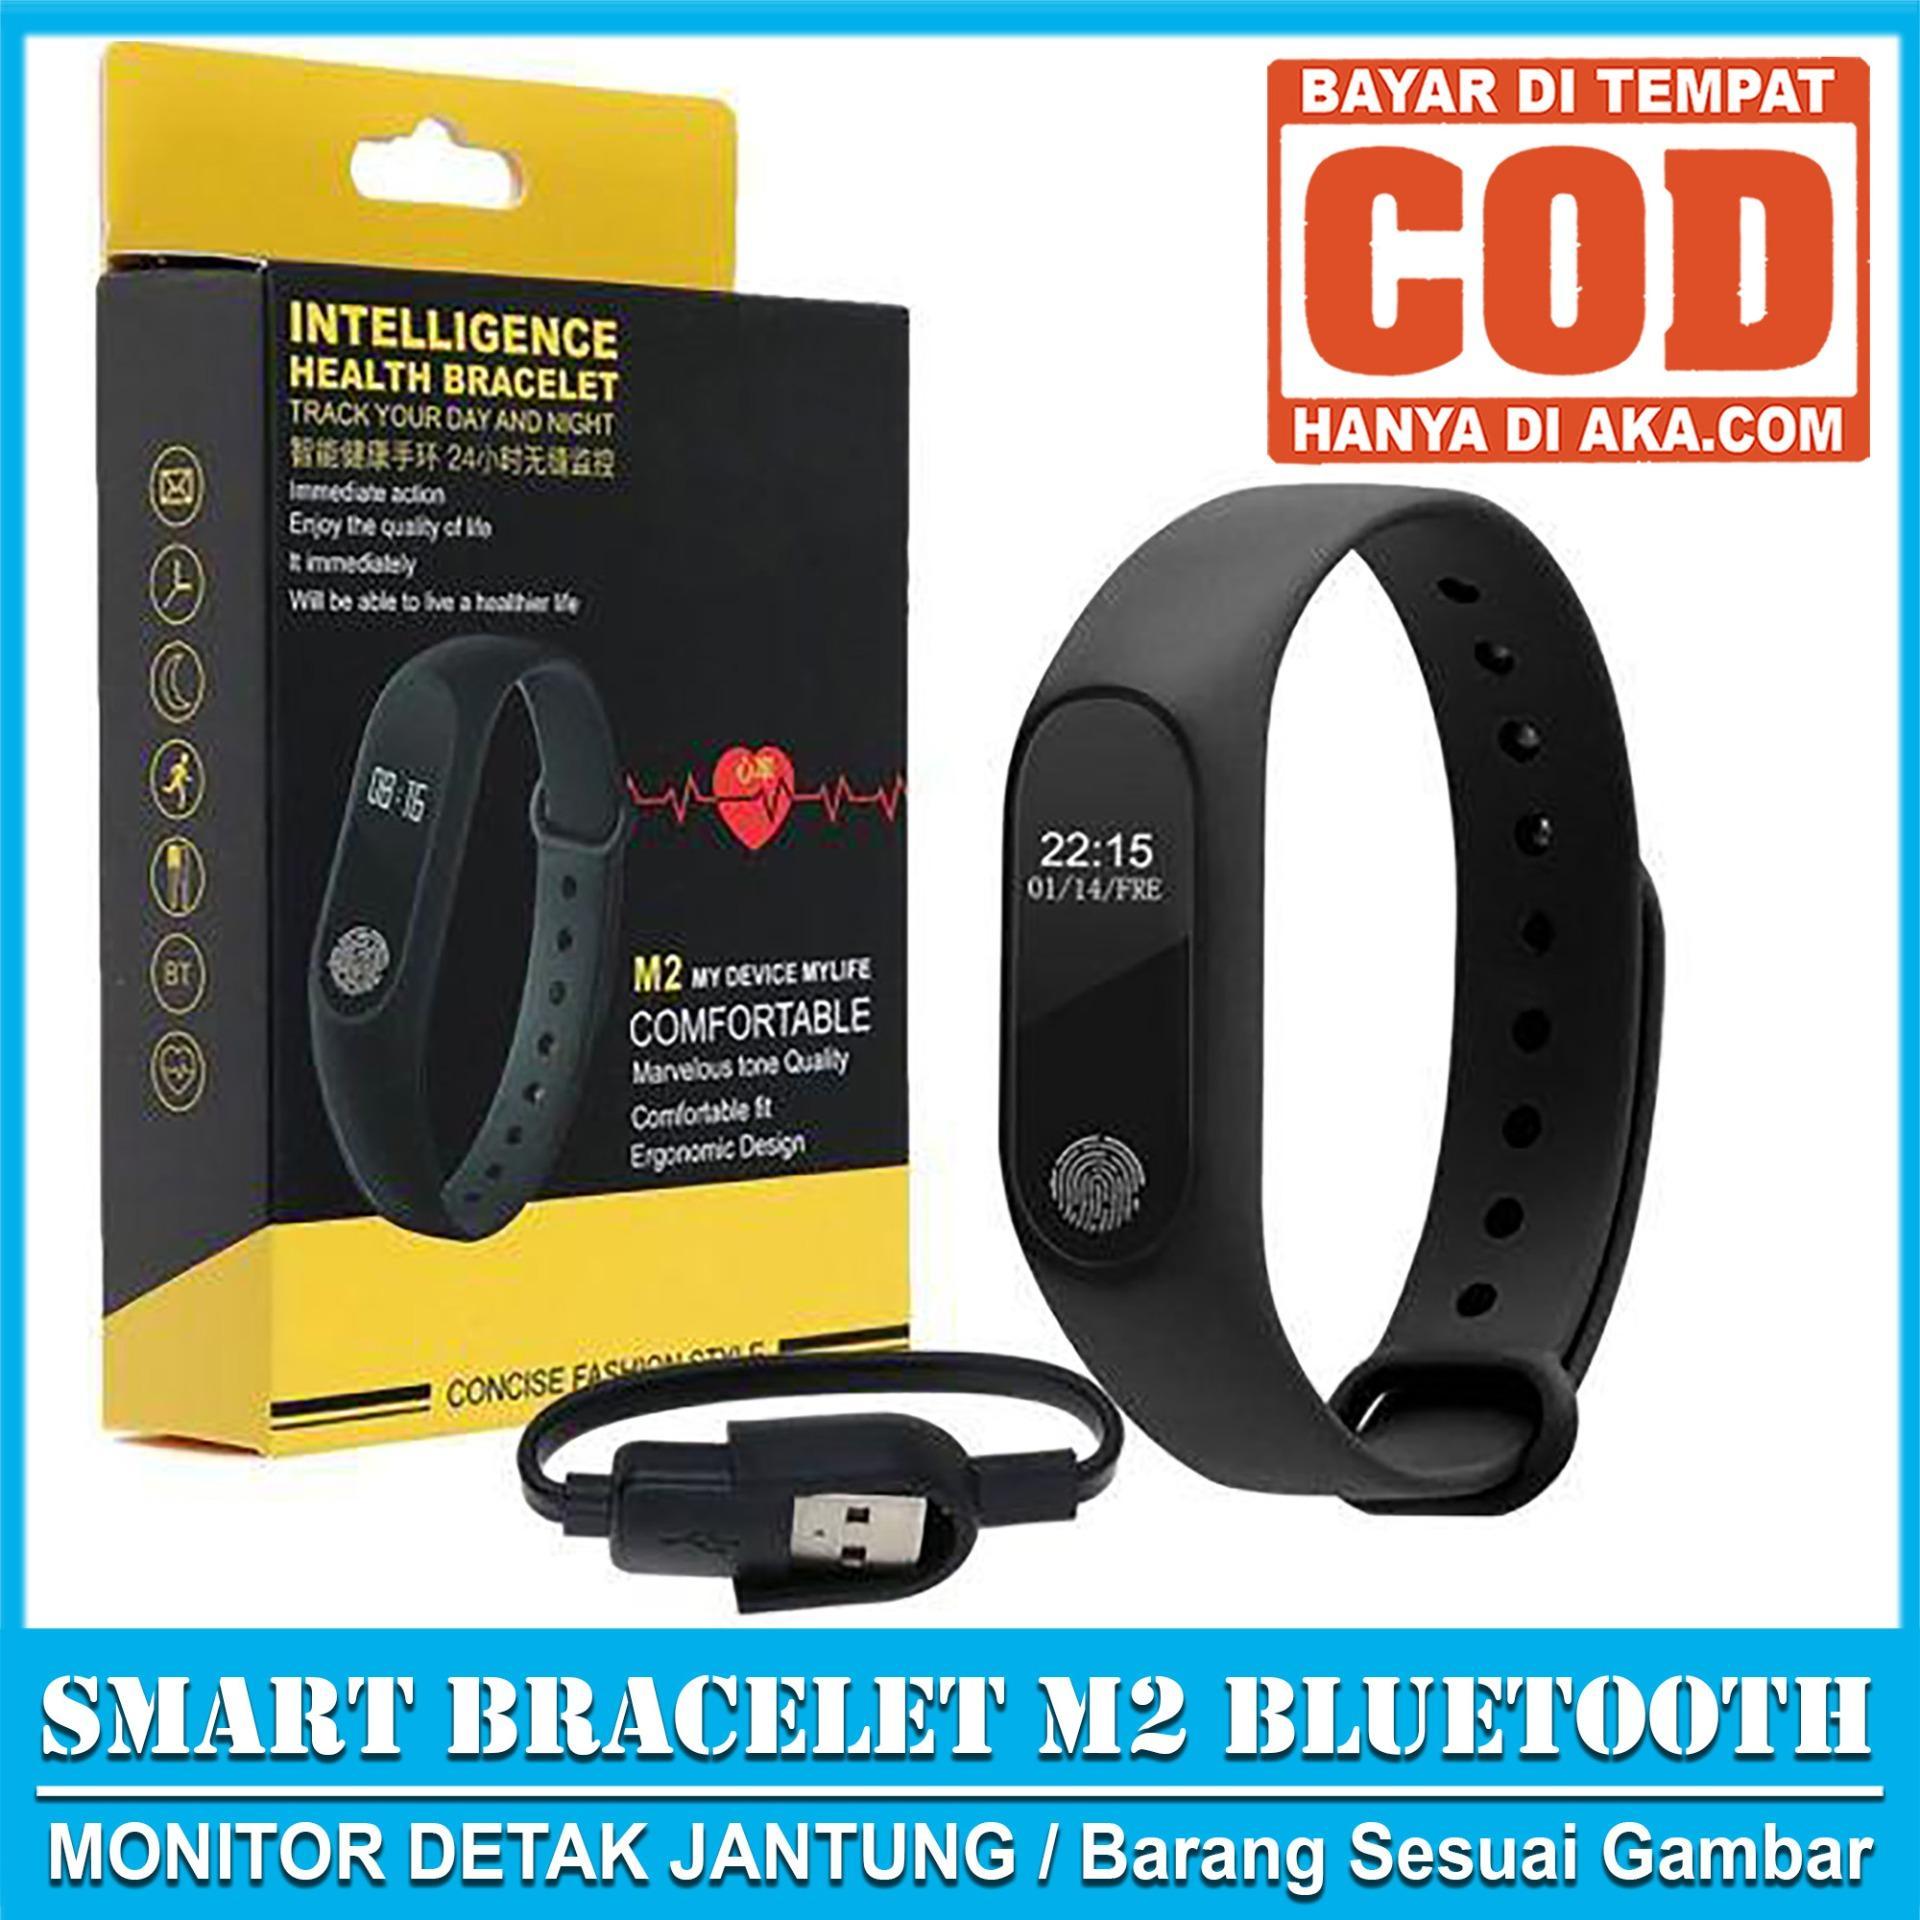 M2 Smartwatch Smart Watch M2 Sport Band Smartband Heart Rate M2 My Device My Life - Mi Band 2 High Quality